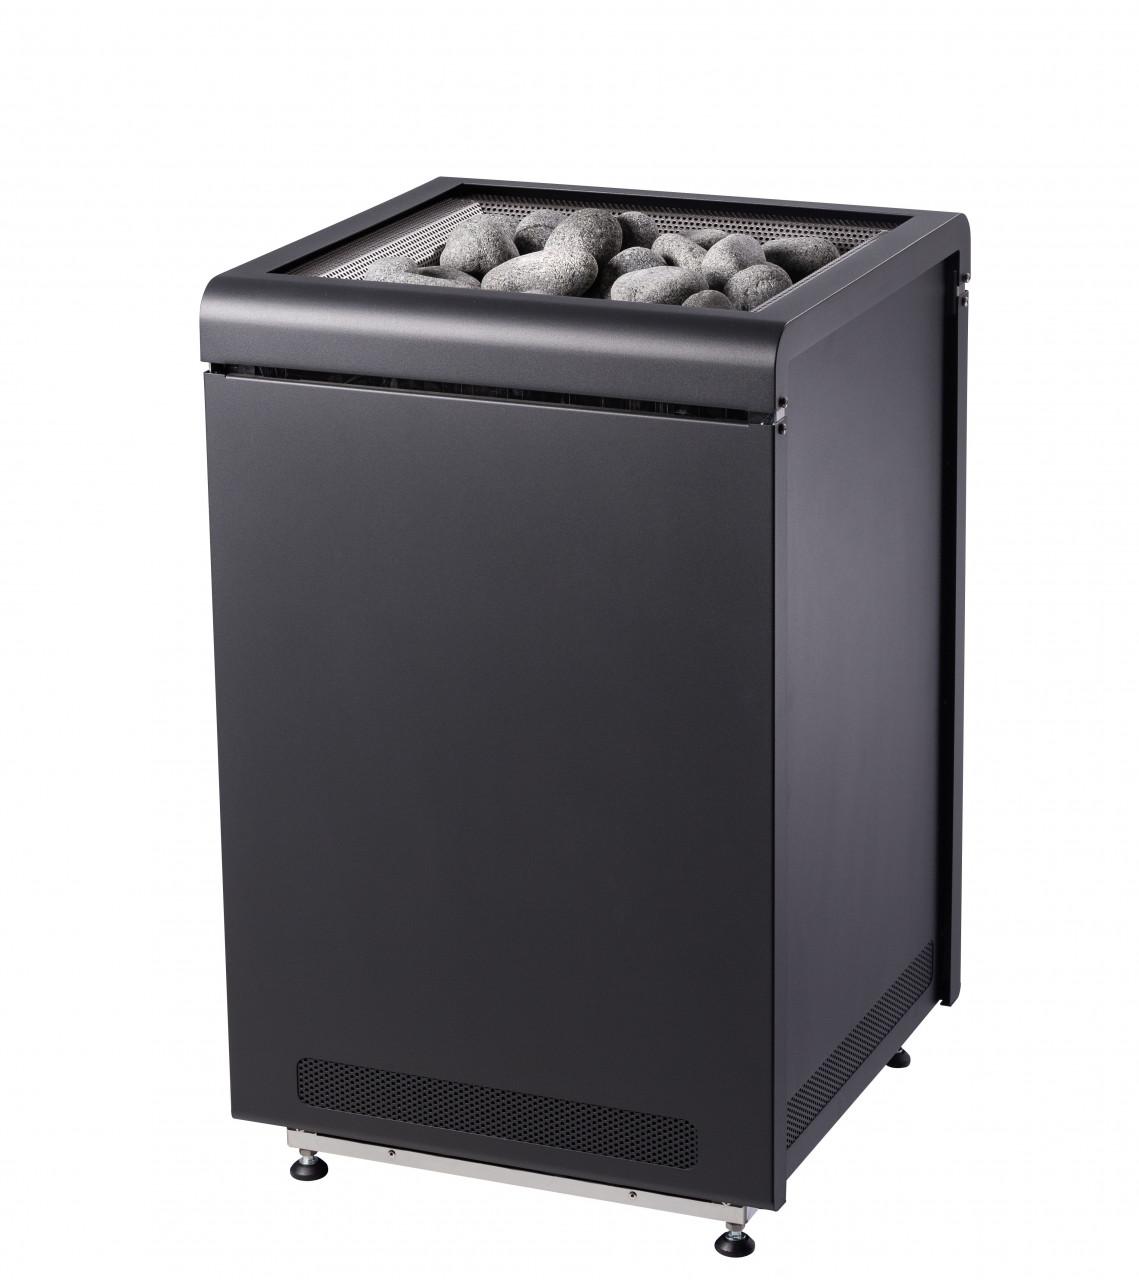 Concept R saunaoven 9.0 & 10.5 kW